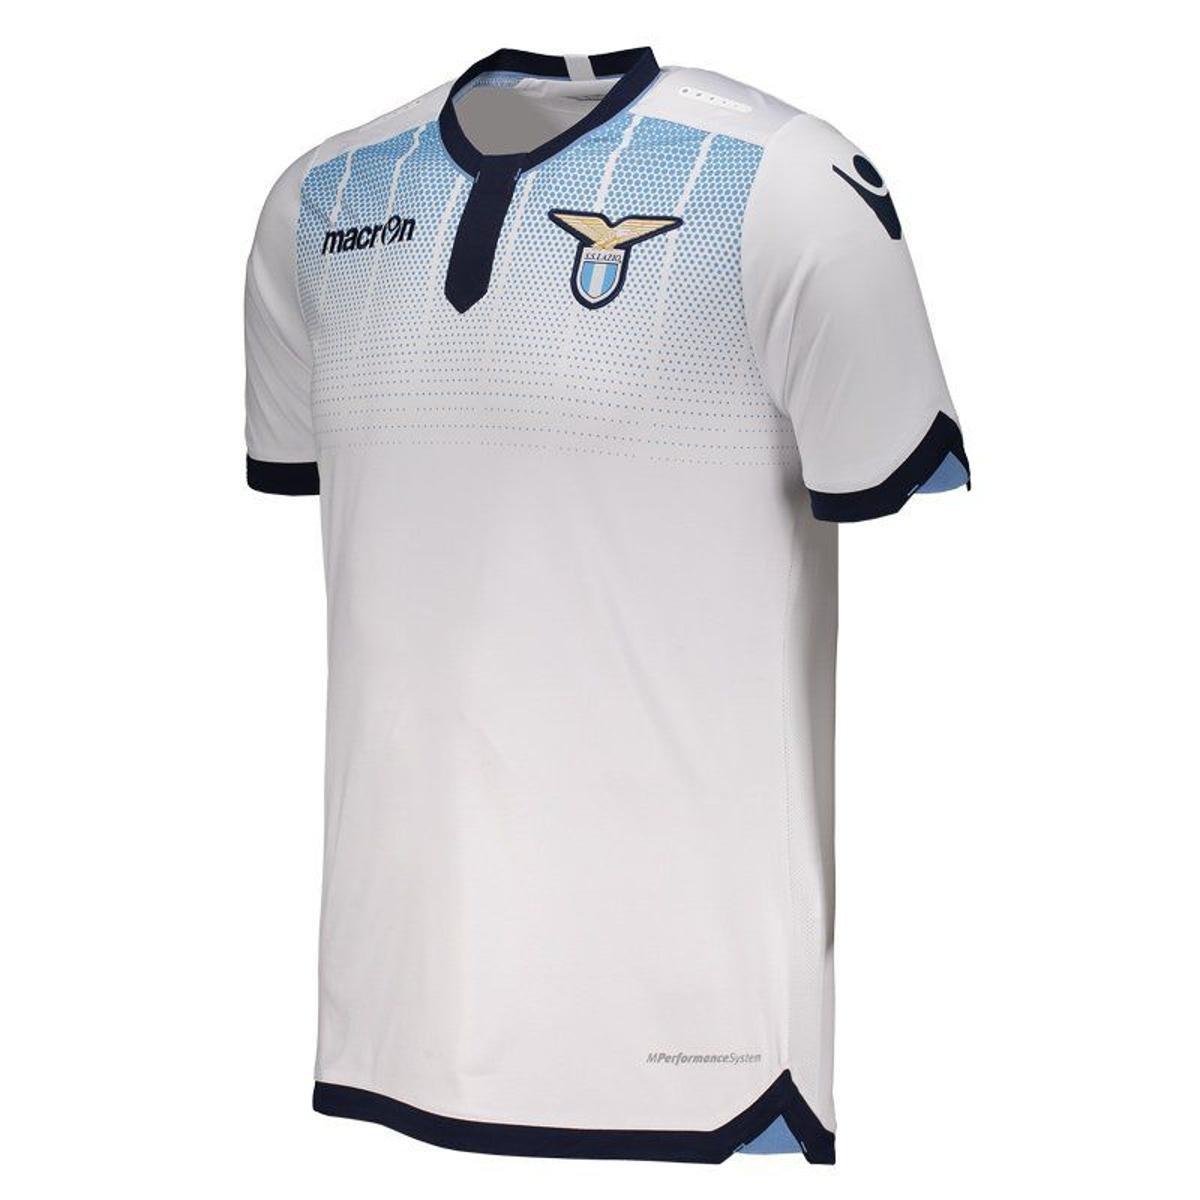 Camisa Macron Lazio Away 2016 Masculina - Branco - Compre Agora ... 1f55667113926